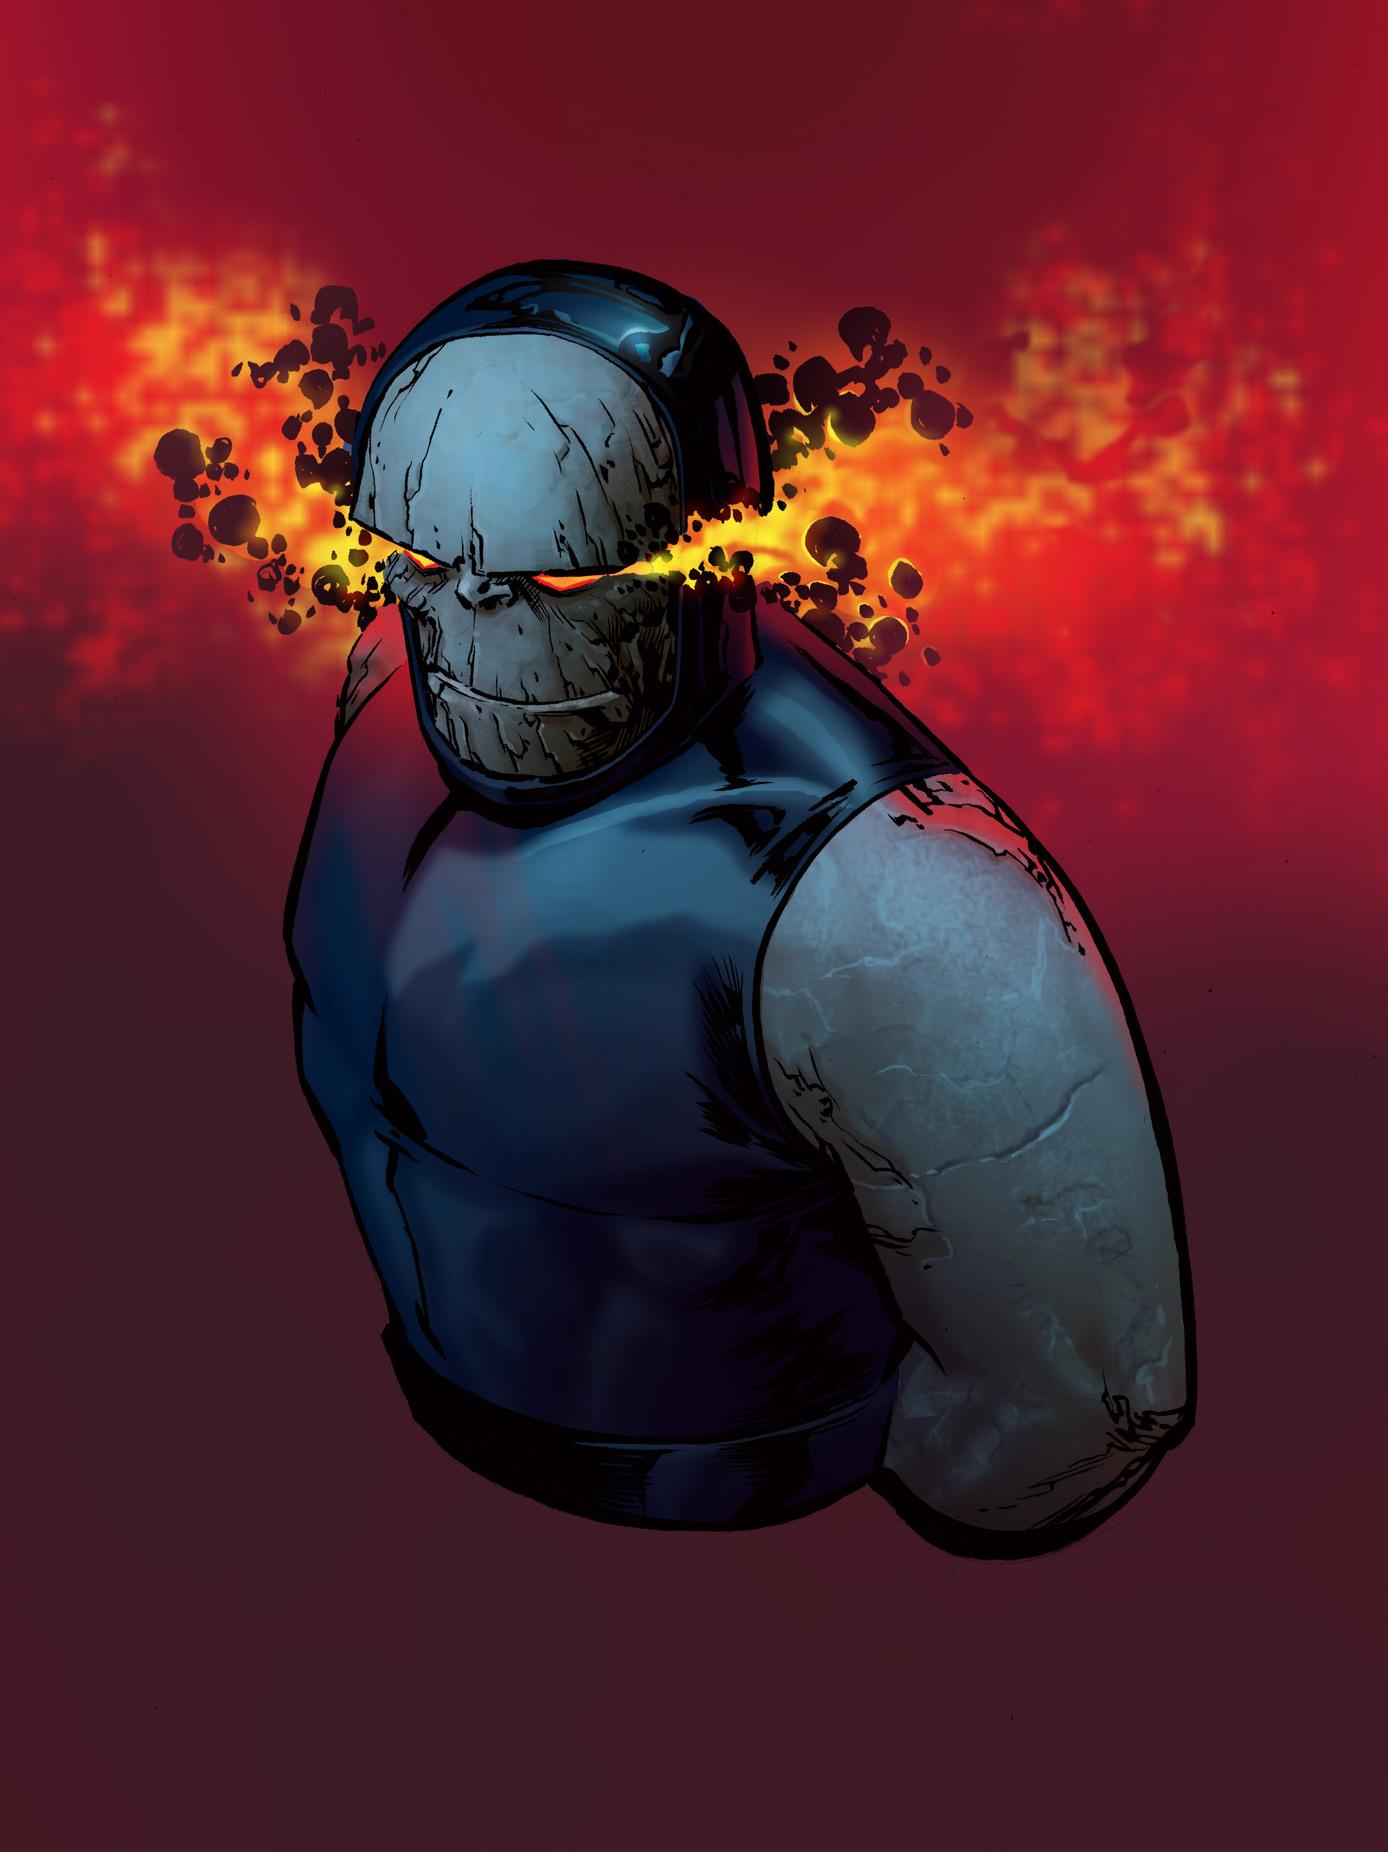 Darkseid by TomRaney on DeviantArt